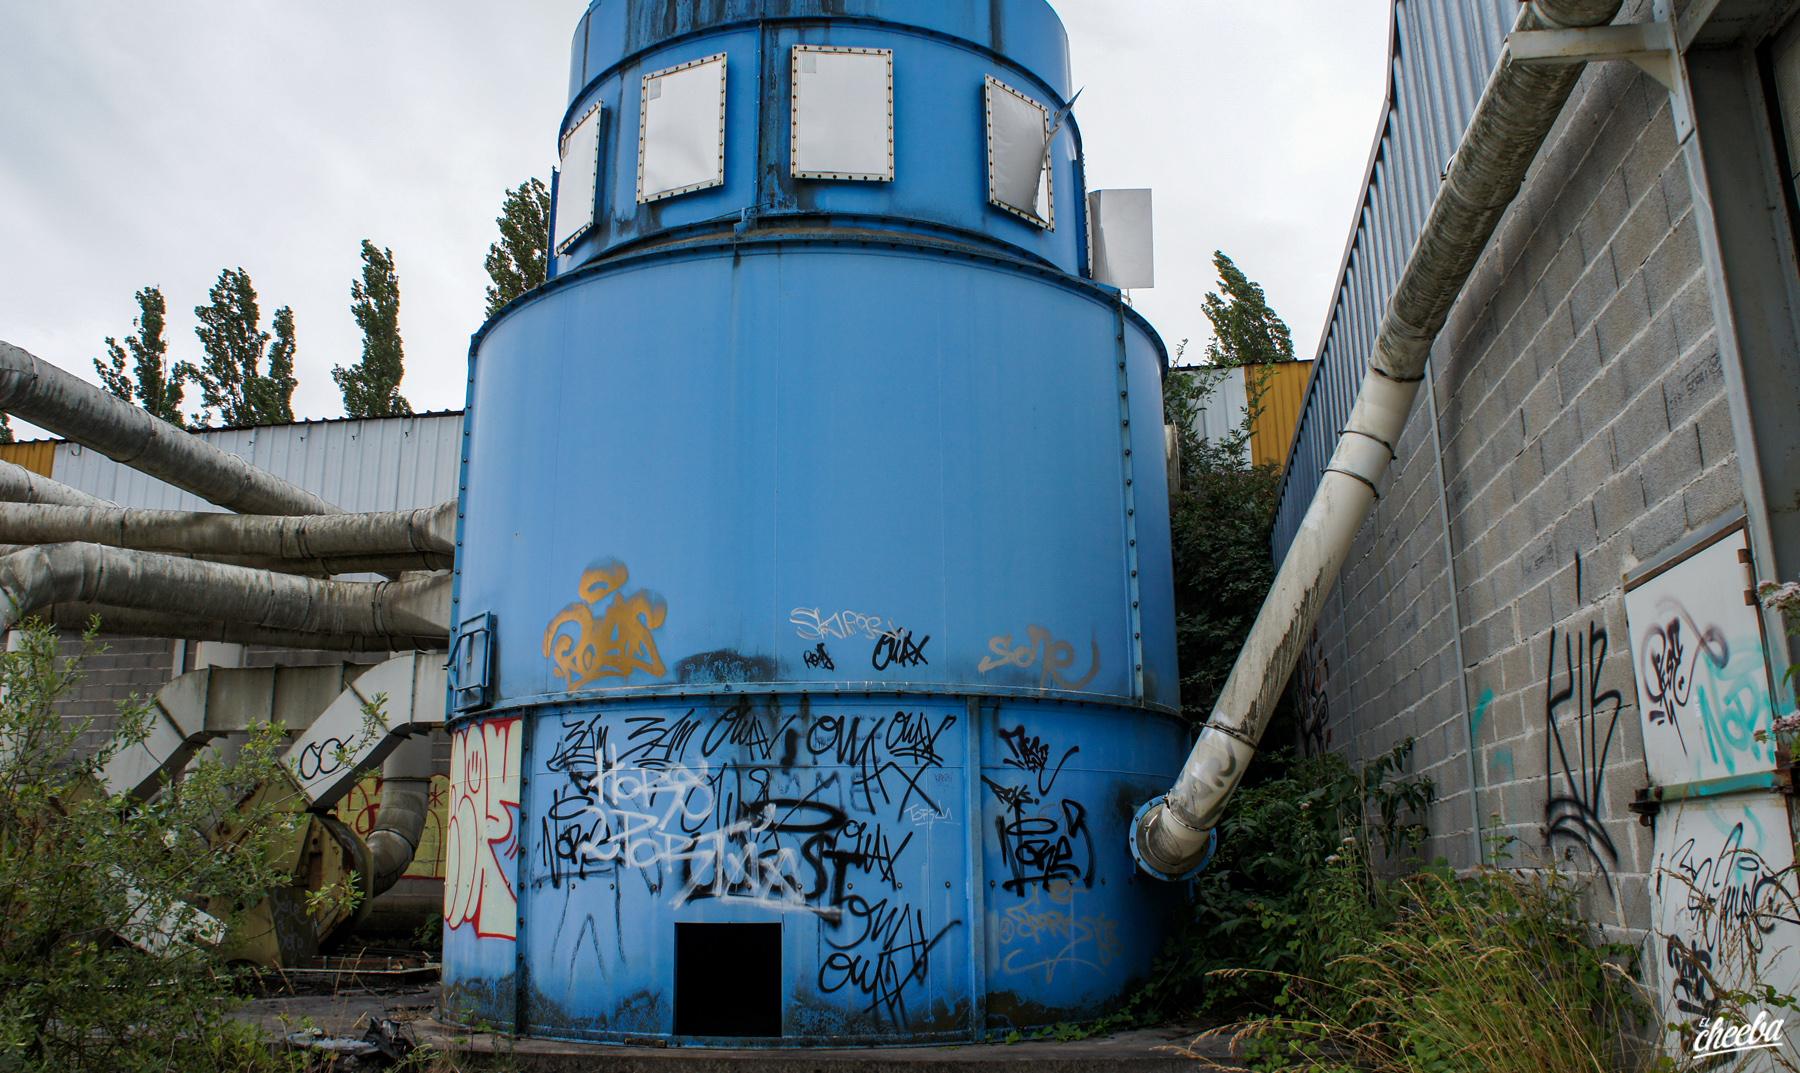 Urbex à l'usine de Meubles Ehalt à Fegersheim - Urbex Alsace by El Cheeba